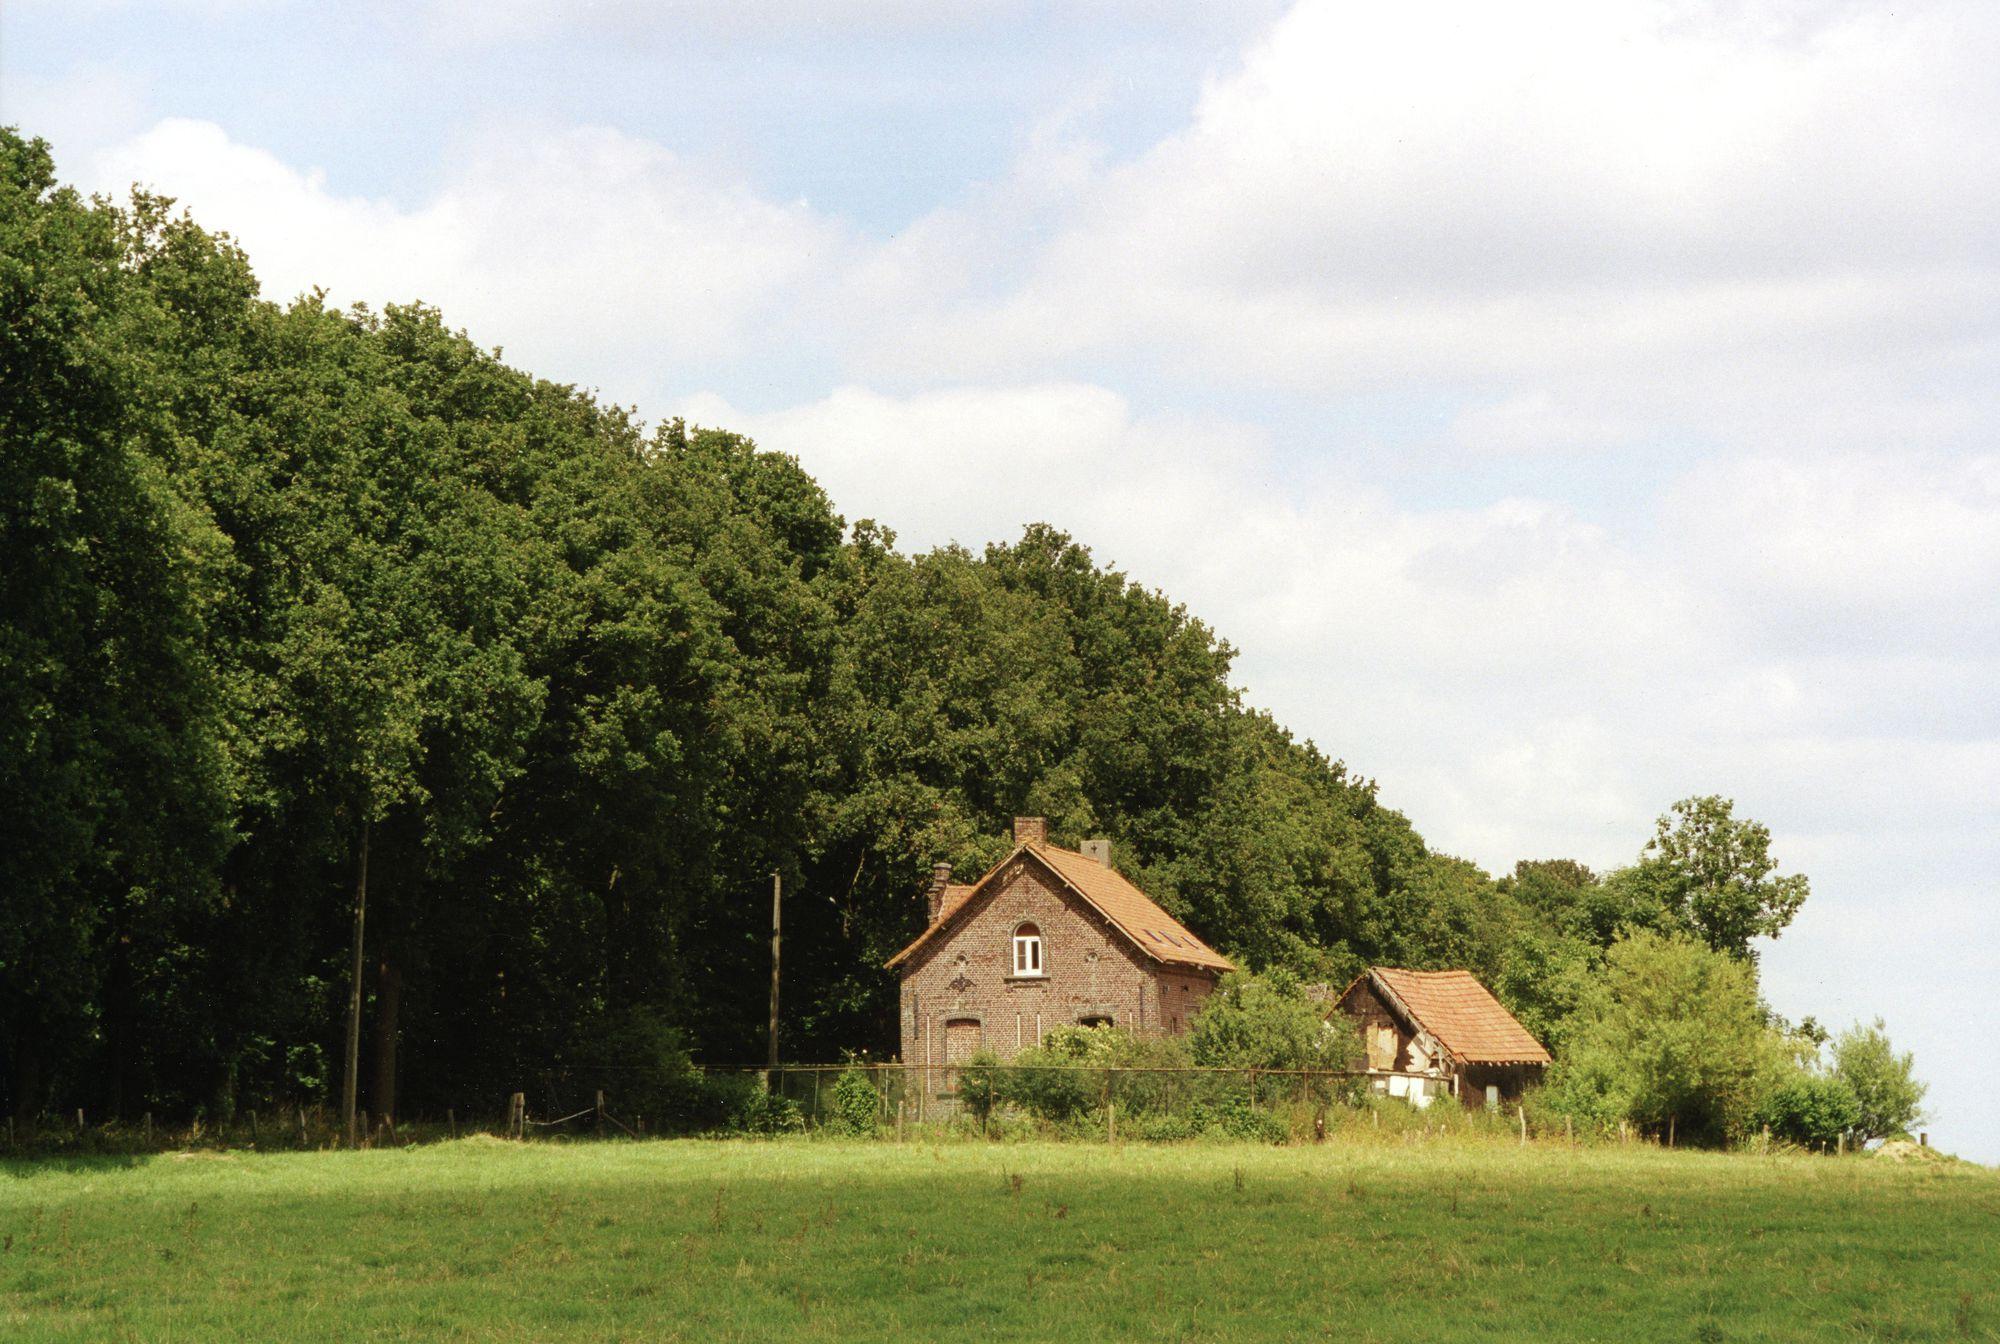 boswachterswoning